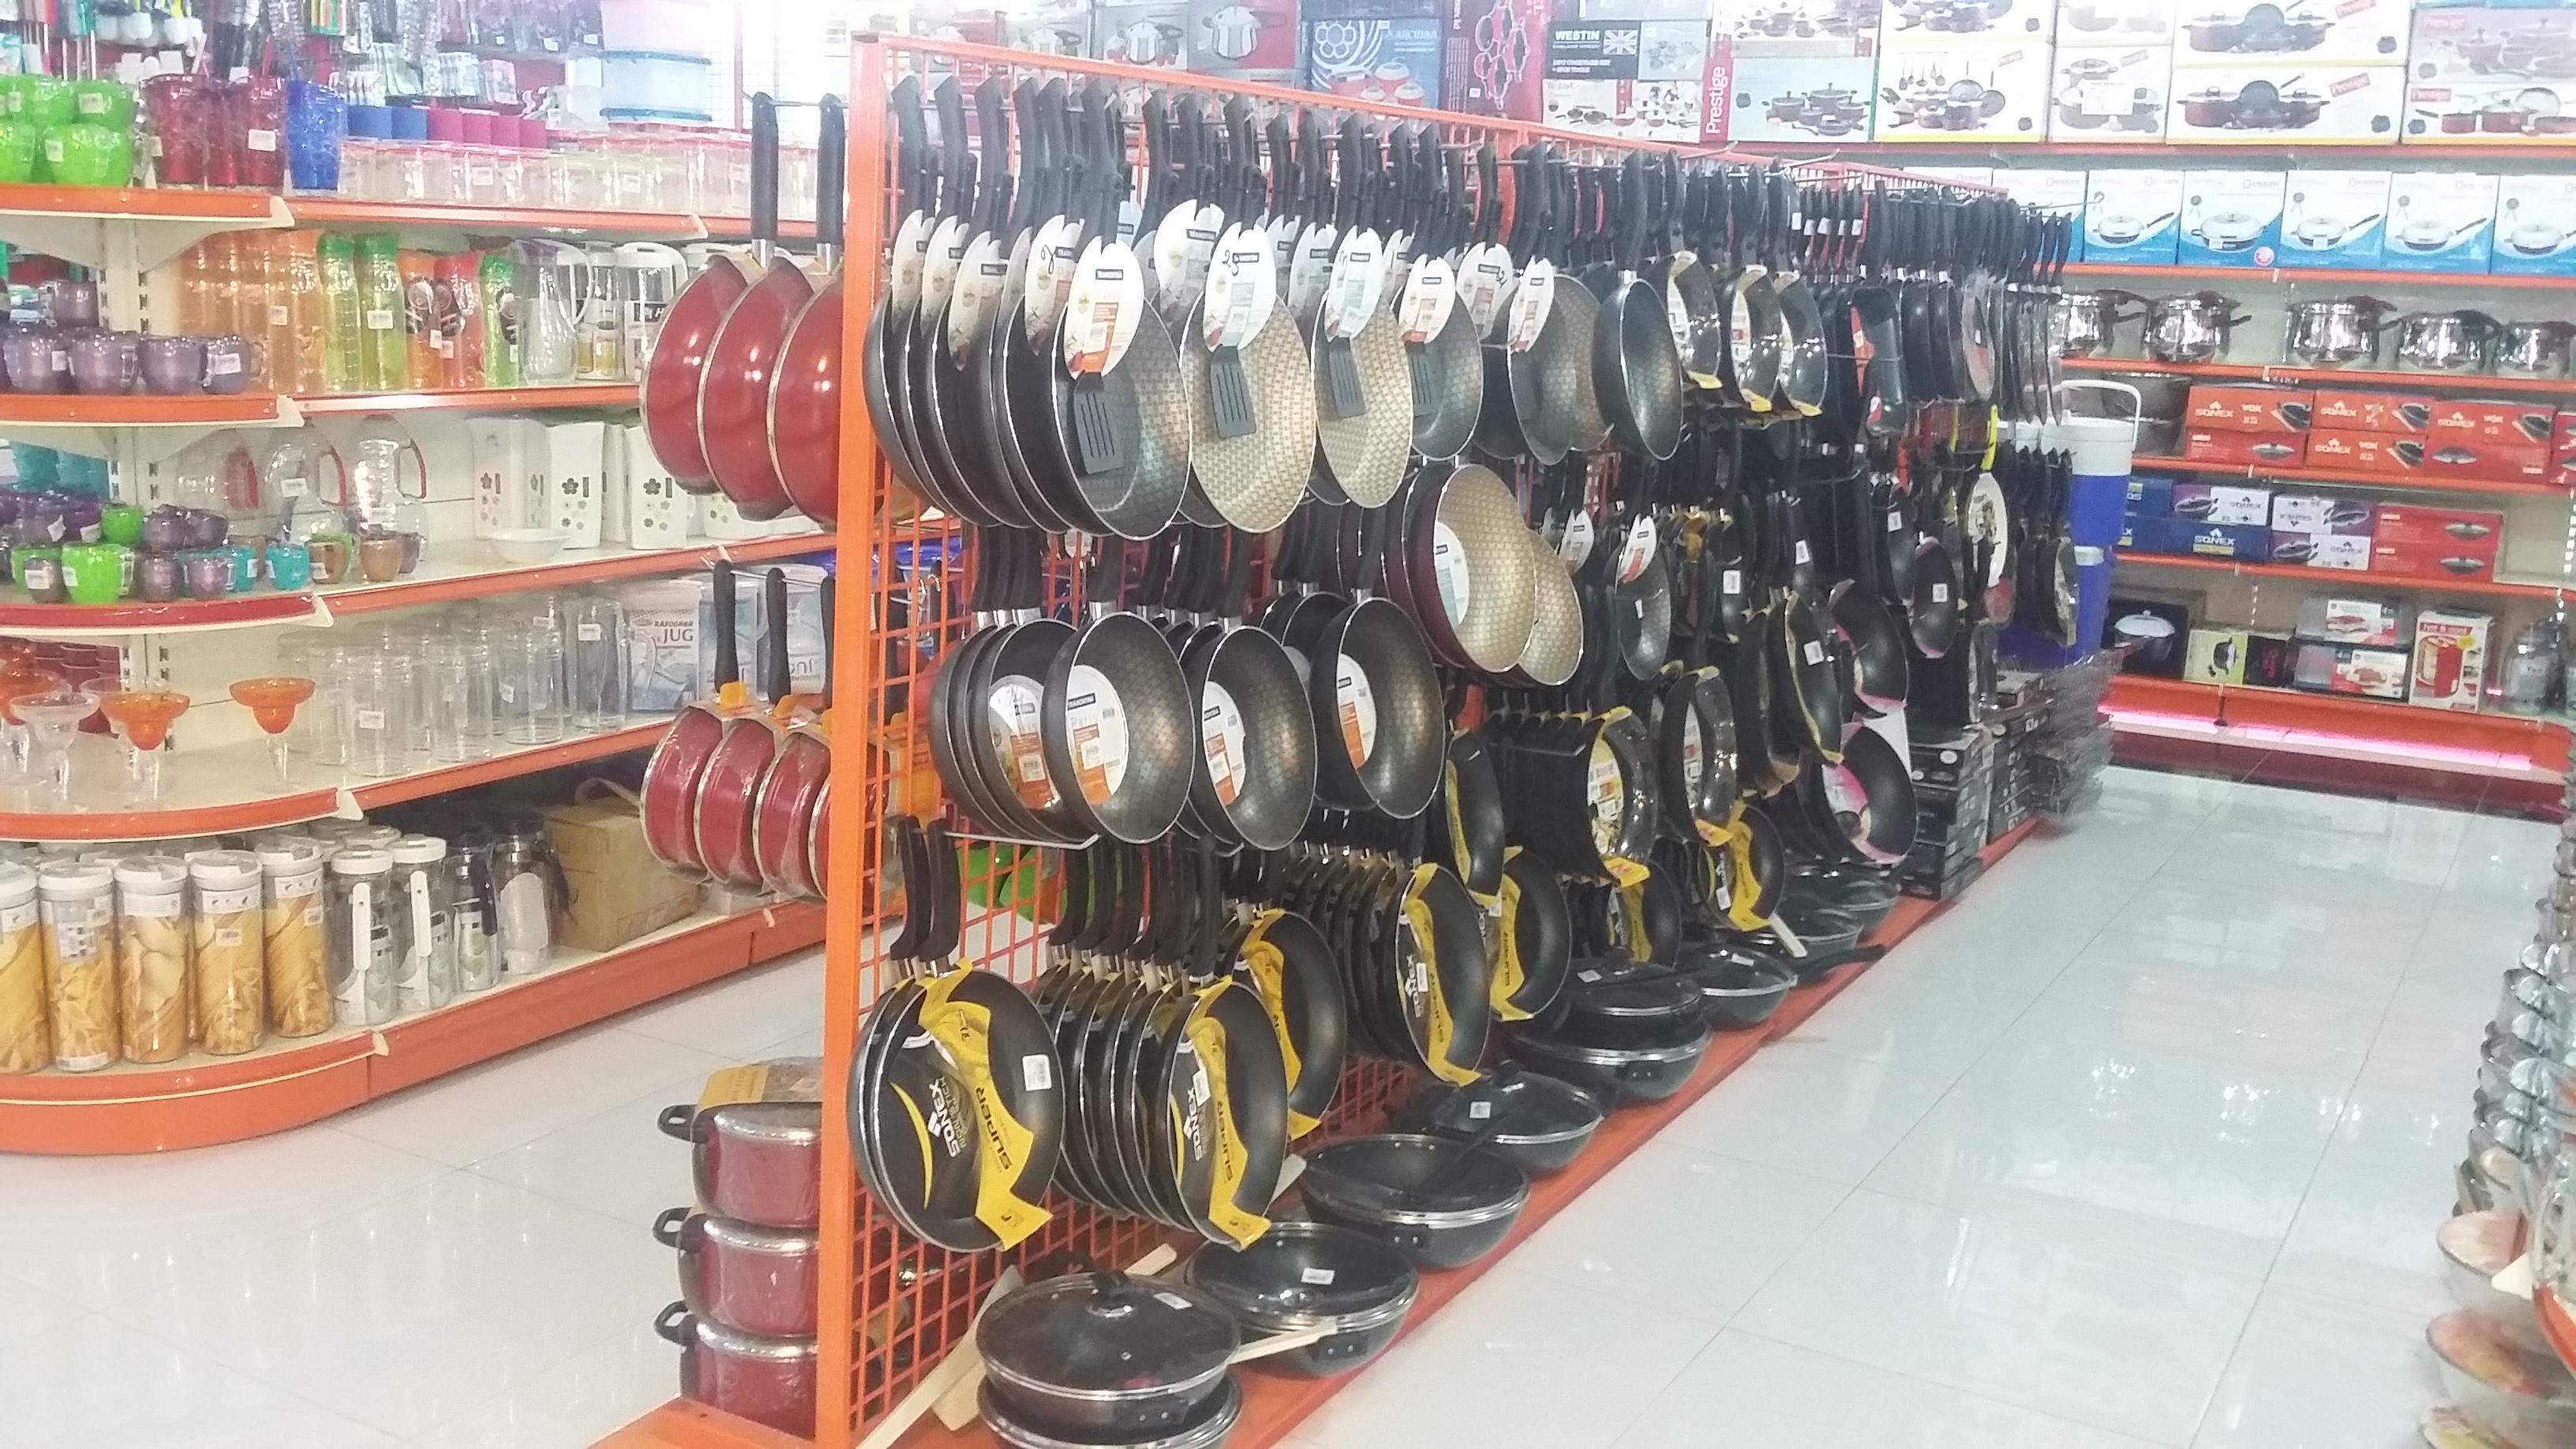 Mesh Wire Rack - Store Space Racks